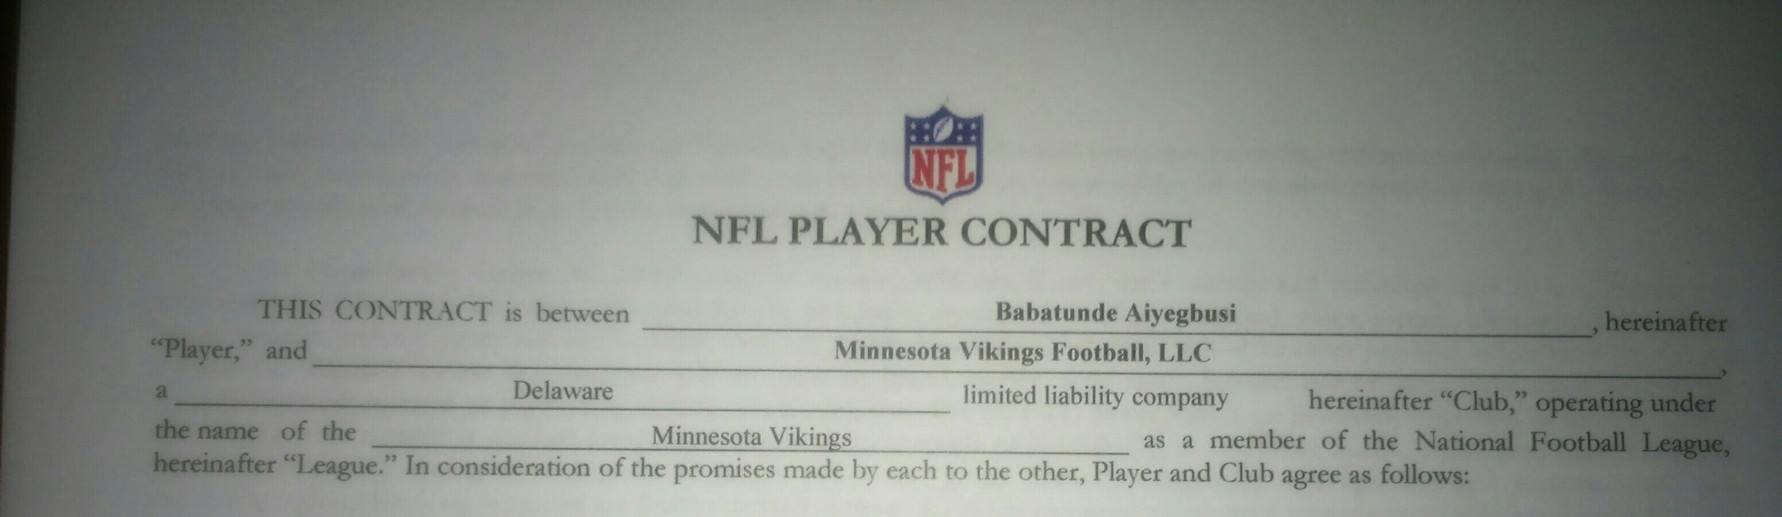 Fotka hráčského kontraktu. Zdroj: Facebook Babs Futbolowo